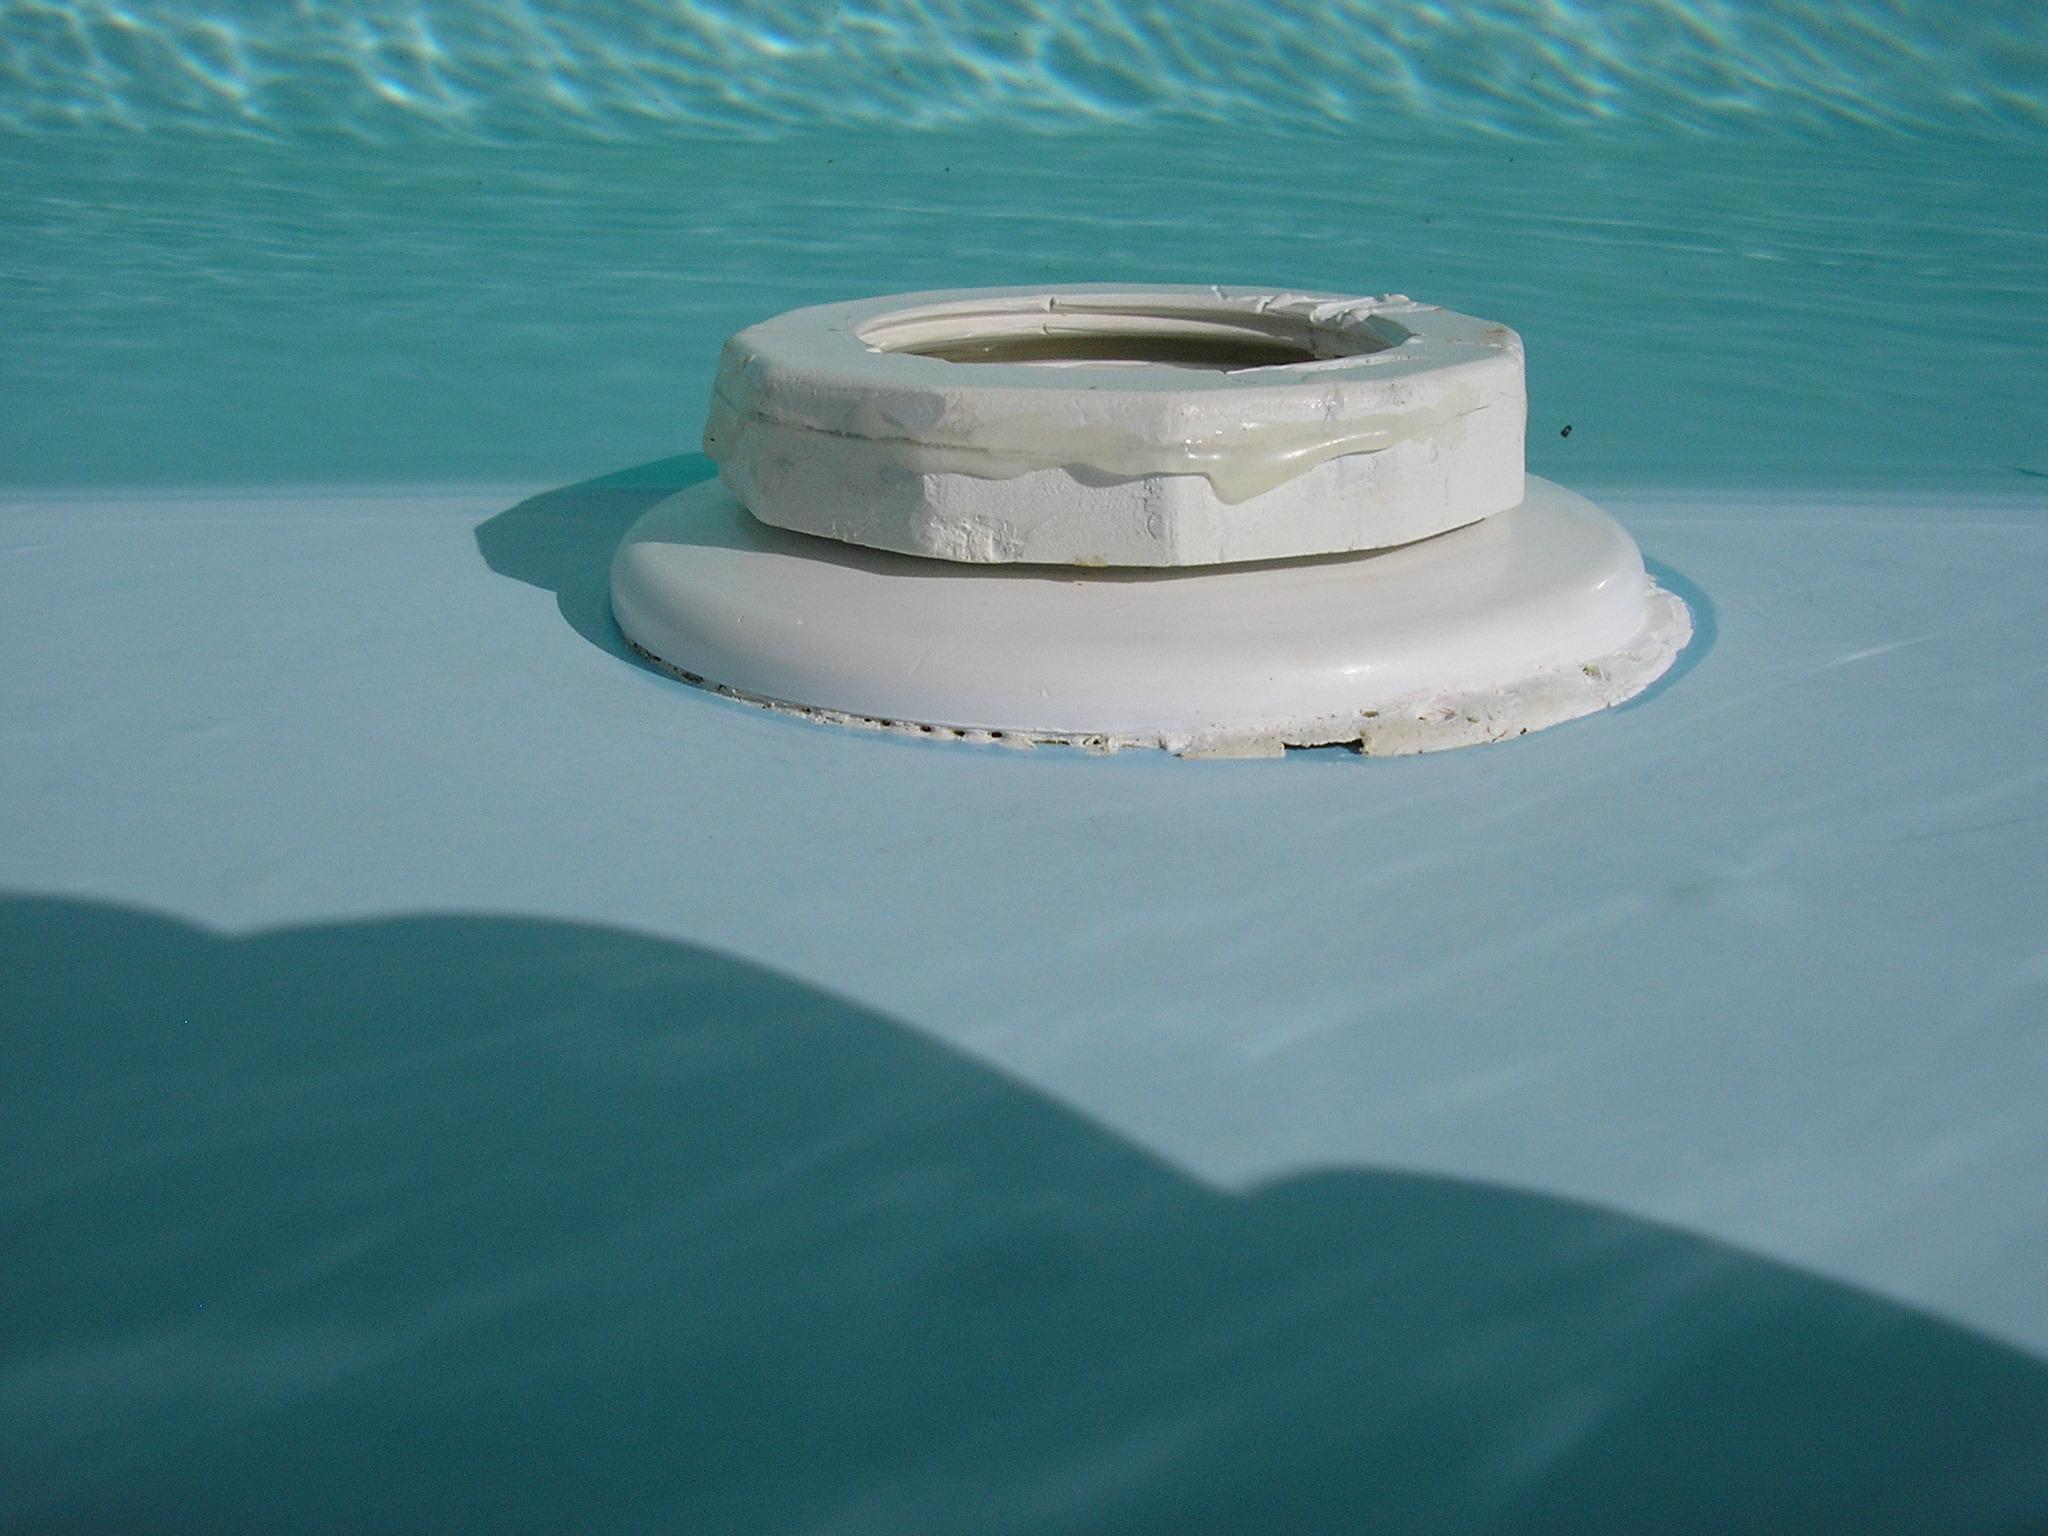 Prise balai polaris piscine coque polyester for Balai piscine